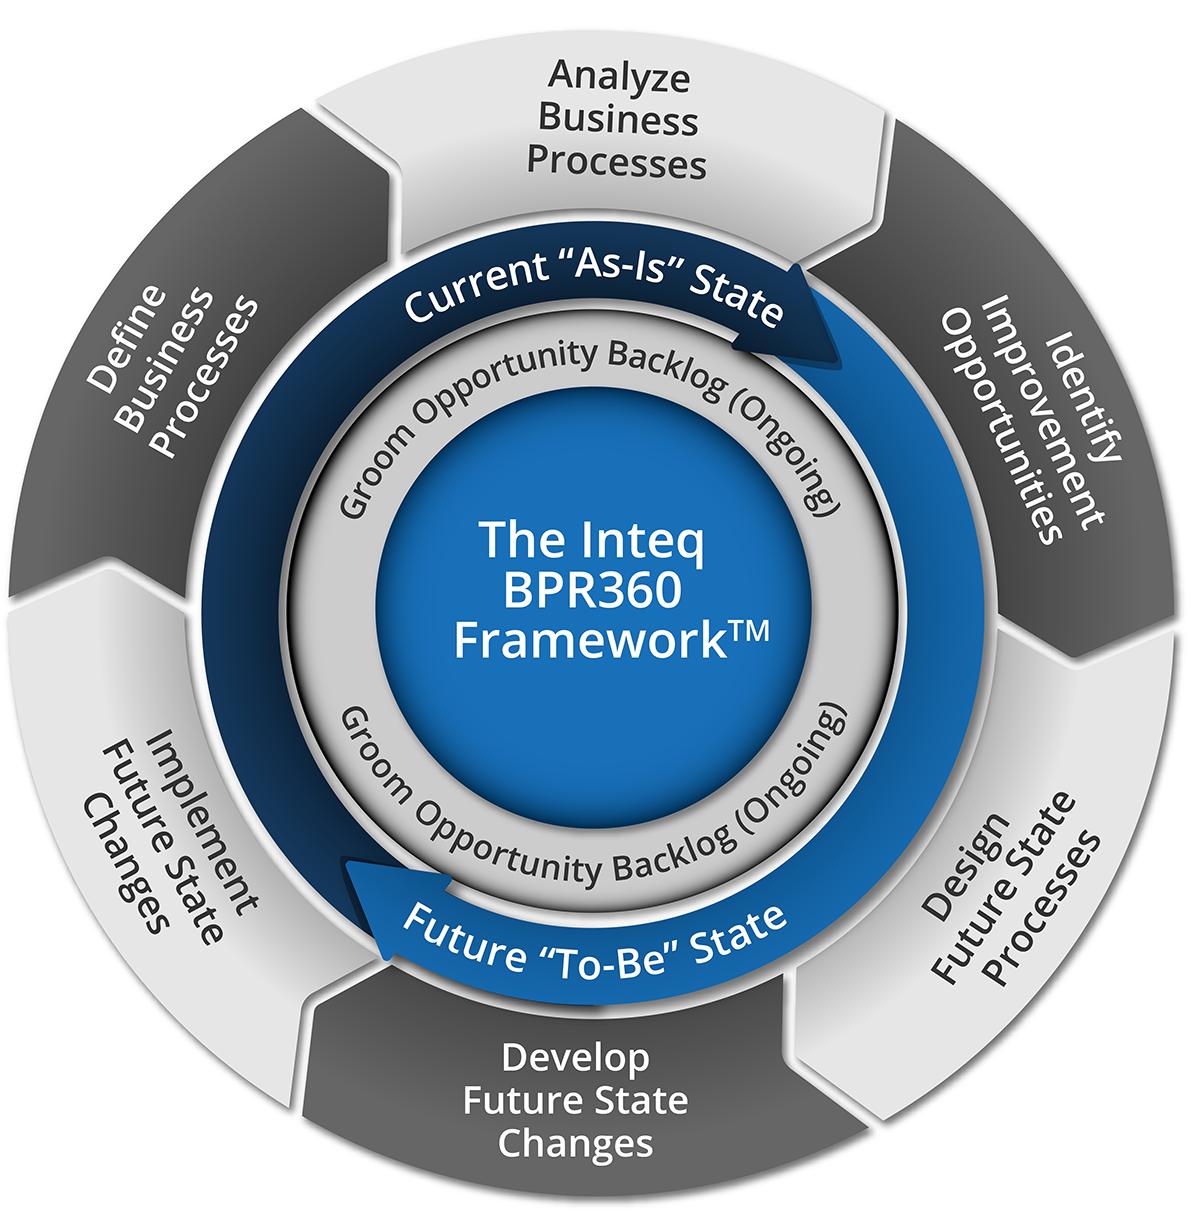 BPR 360 Framework